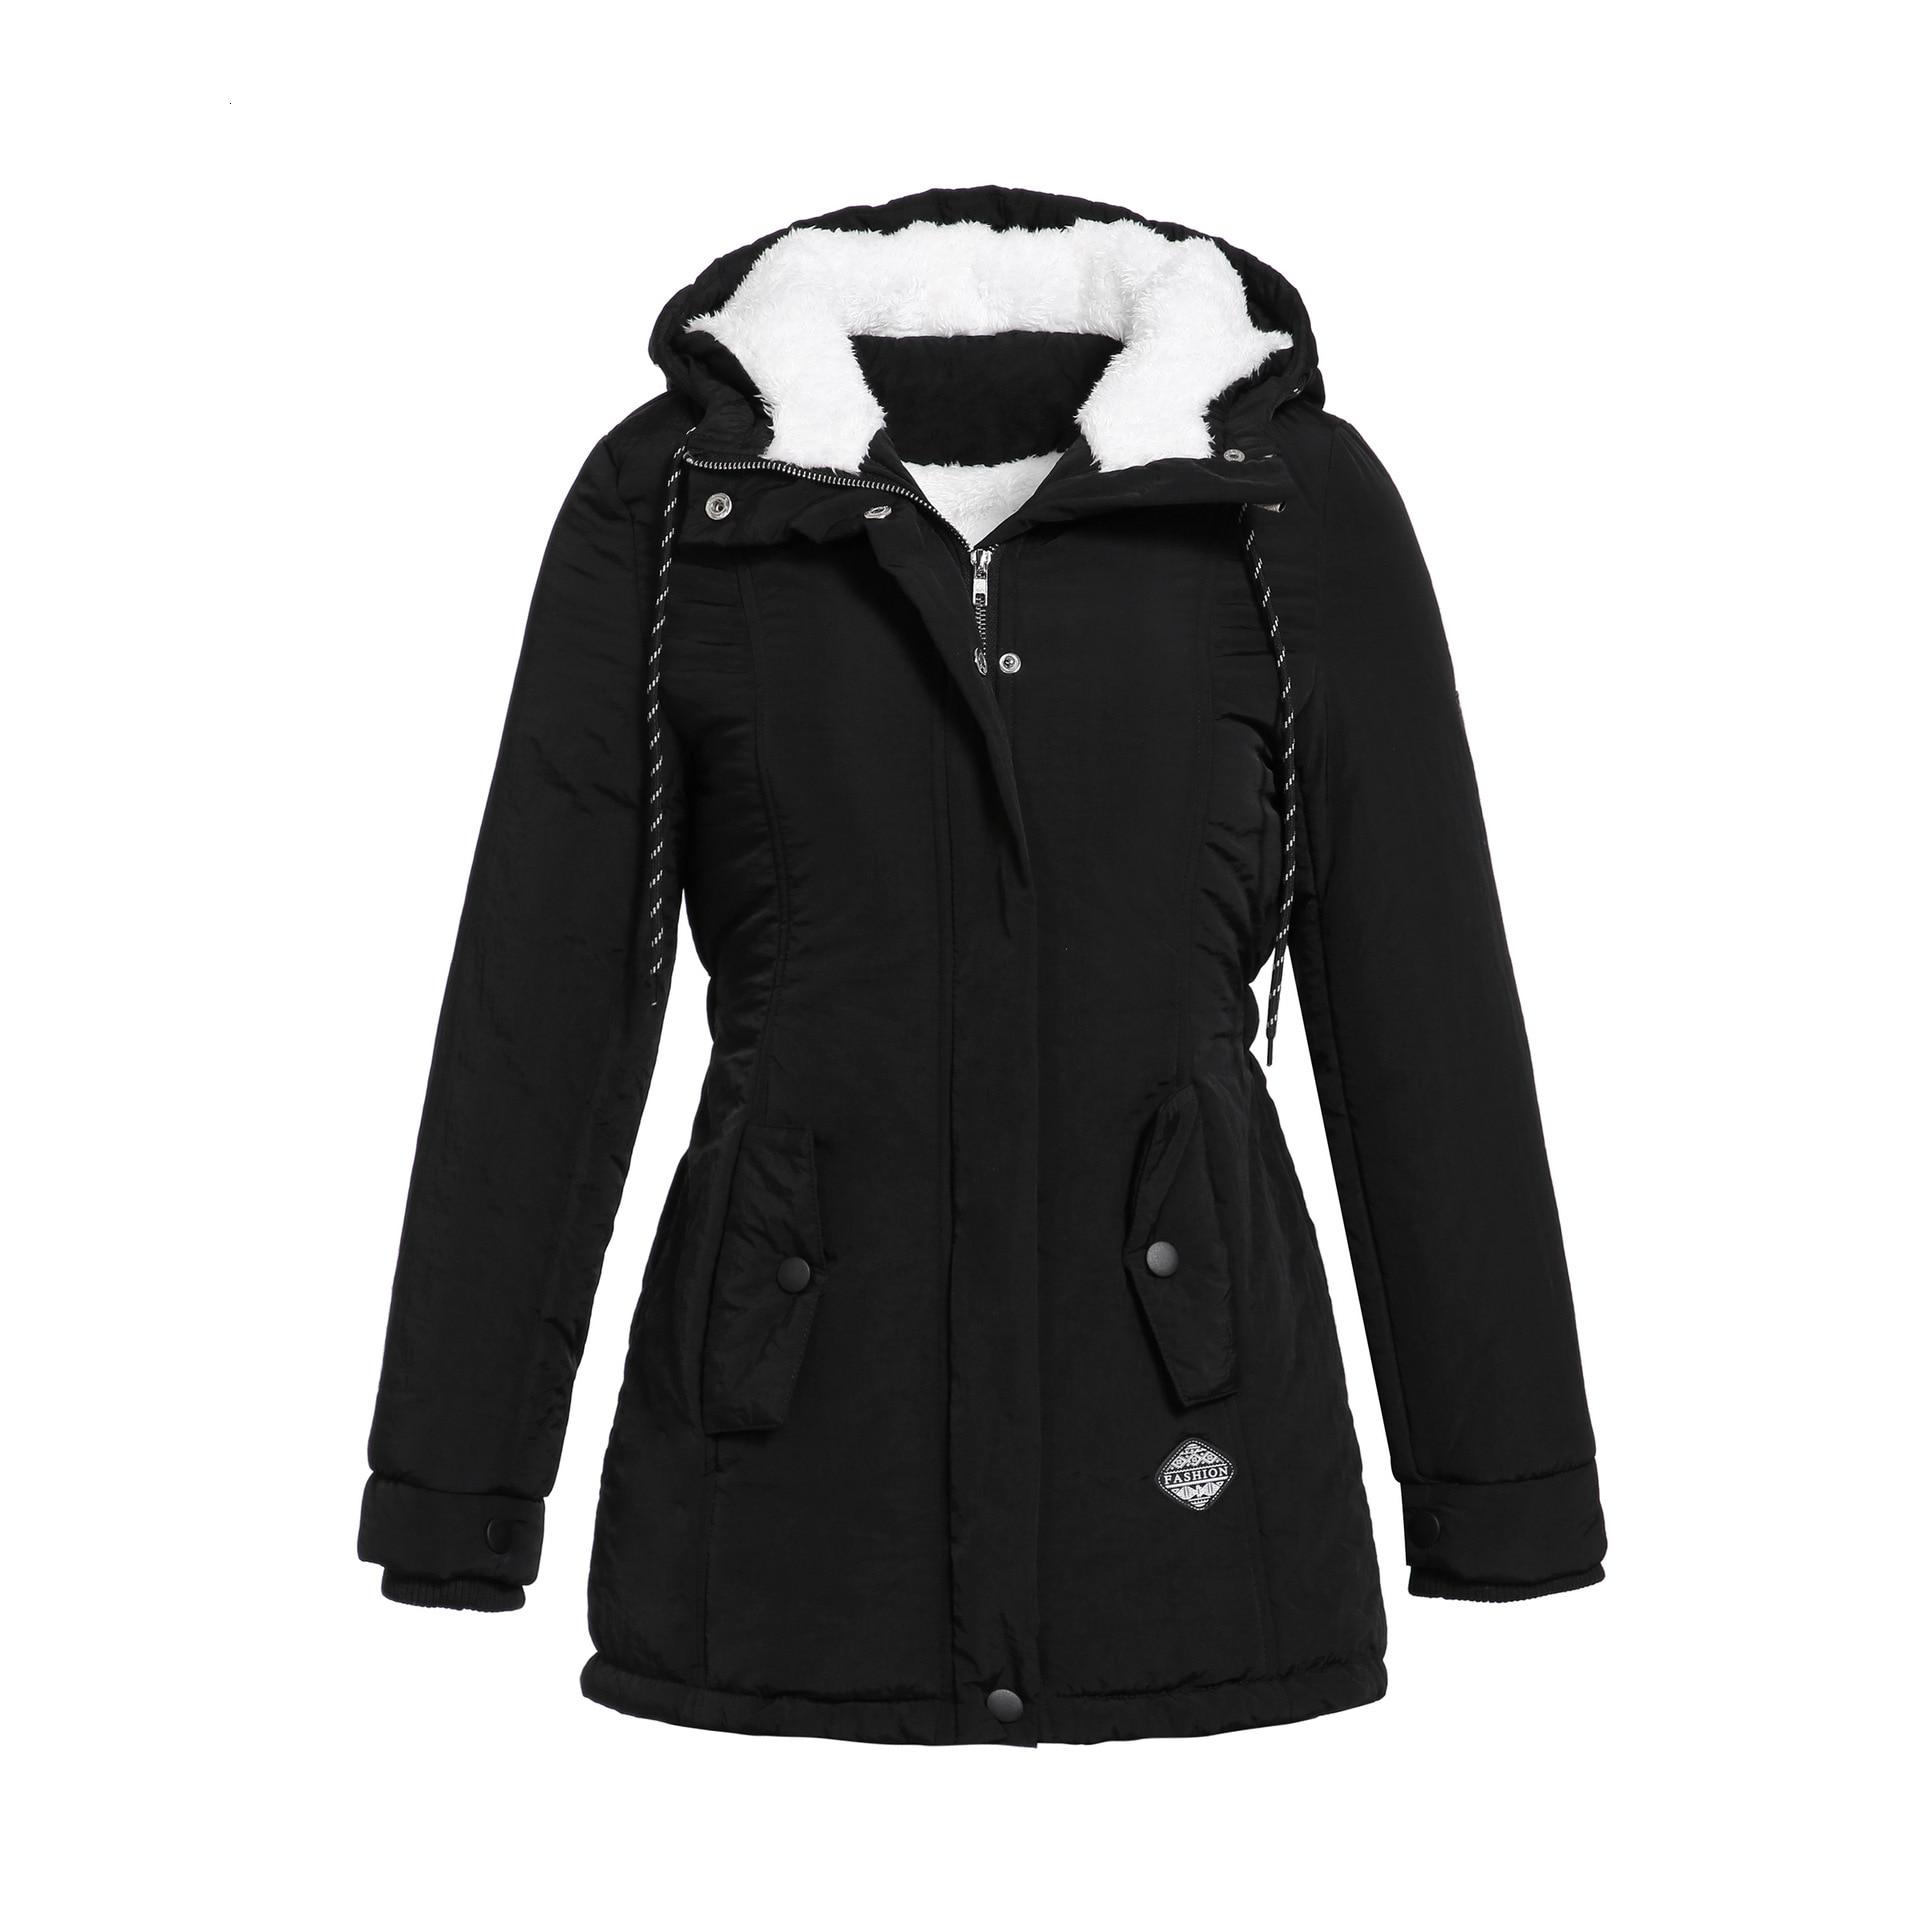 RICORIT Women Parkas Winter Jacket Hooded Thick Cotton Plus Size Warm Female Coat Fashion Mid Long Wadded Coat Jacket Outwear